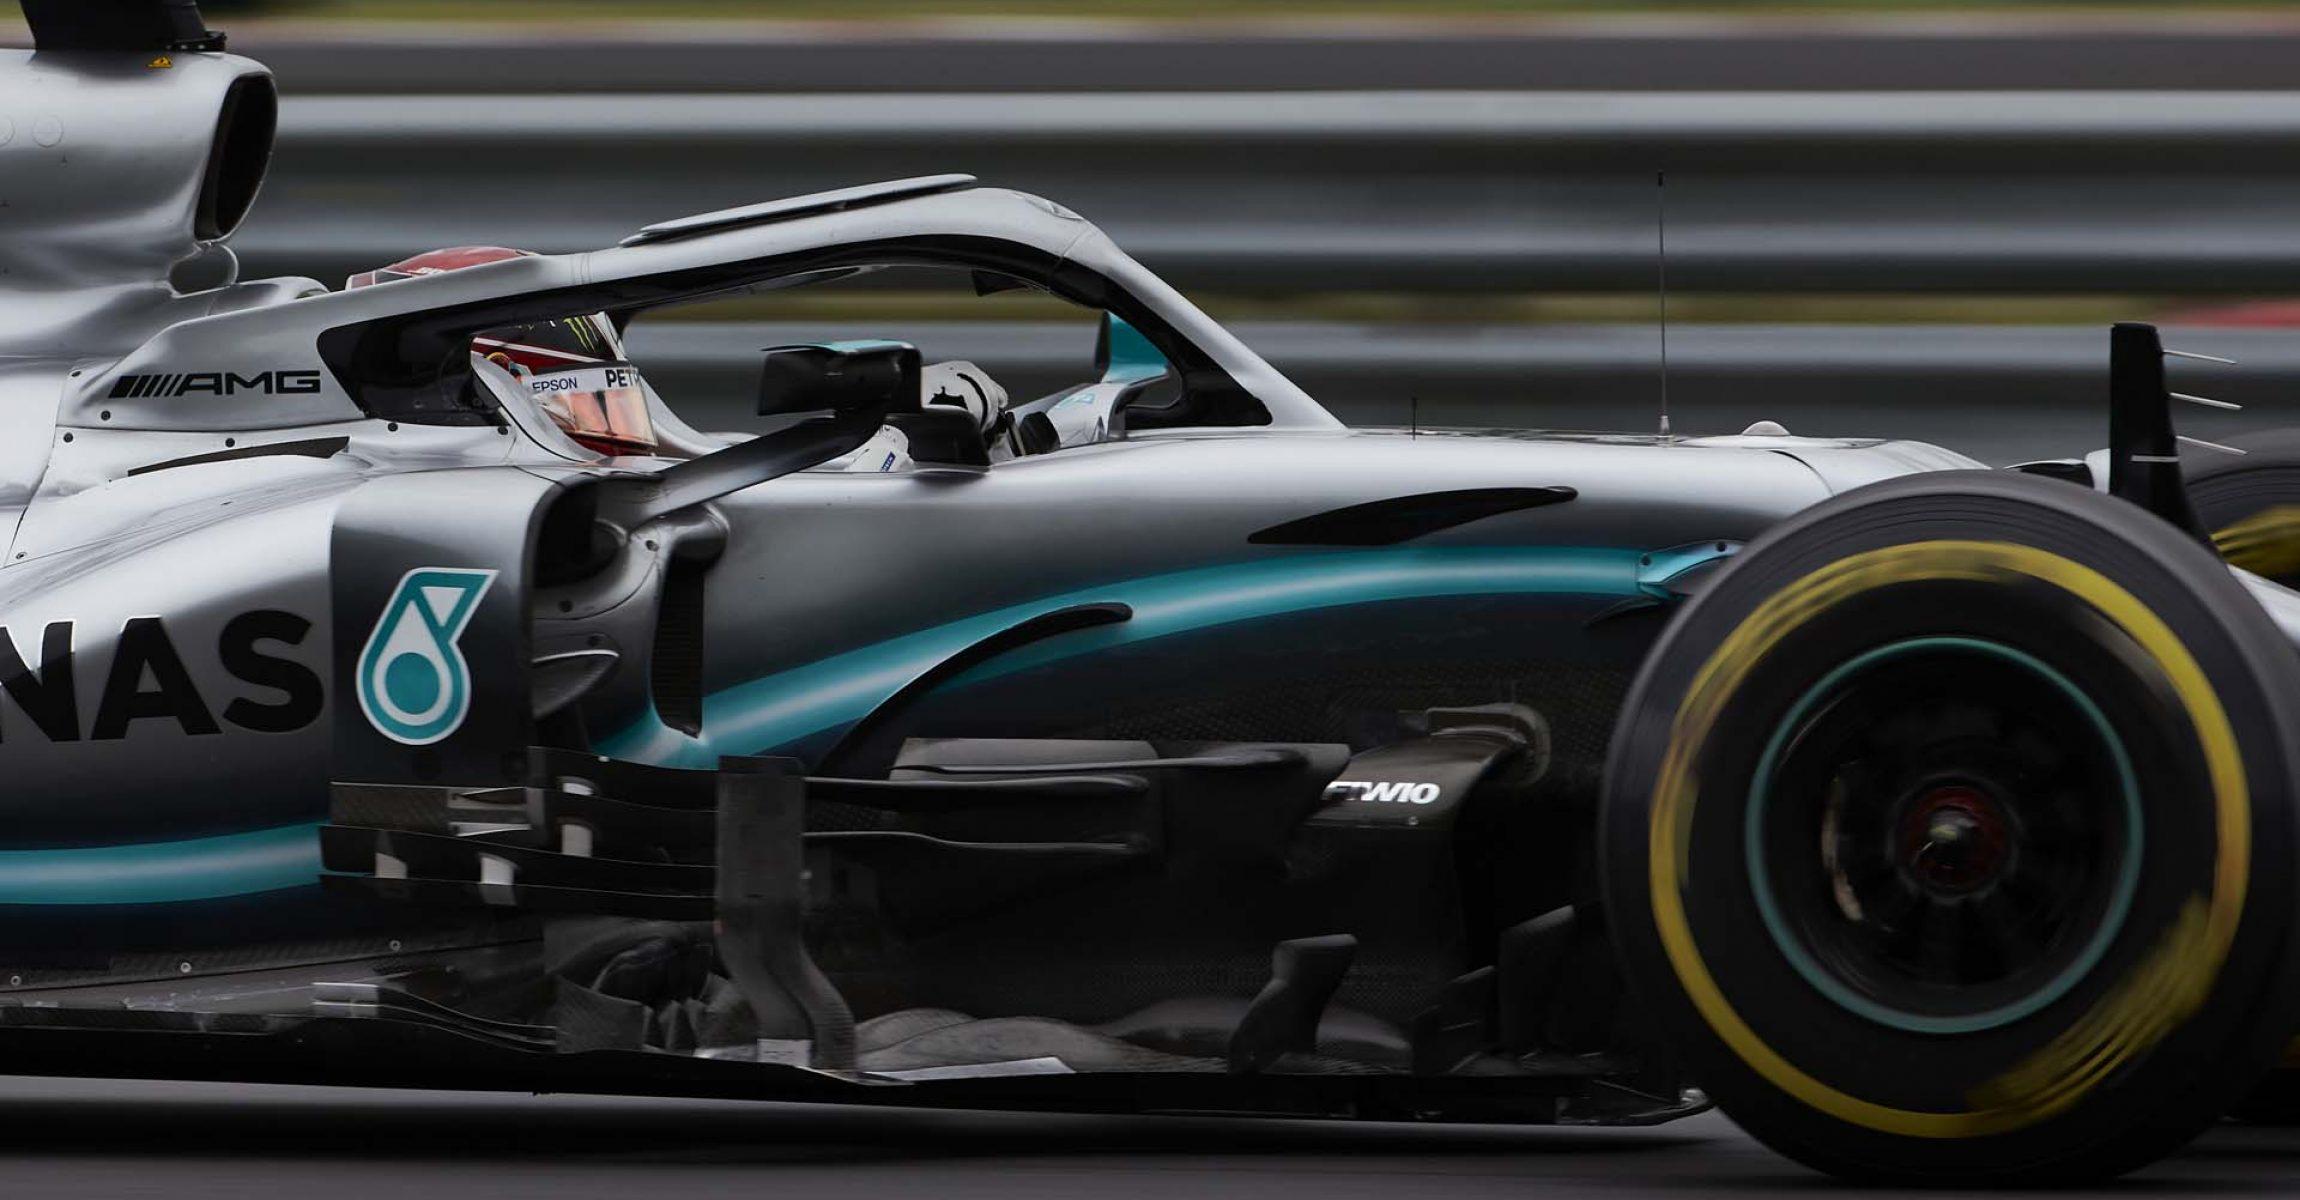 2019 Hungarian Grand Prix, Friday - Steve Etherington Lewis Hamilton Mercedes